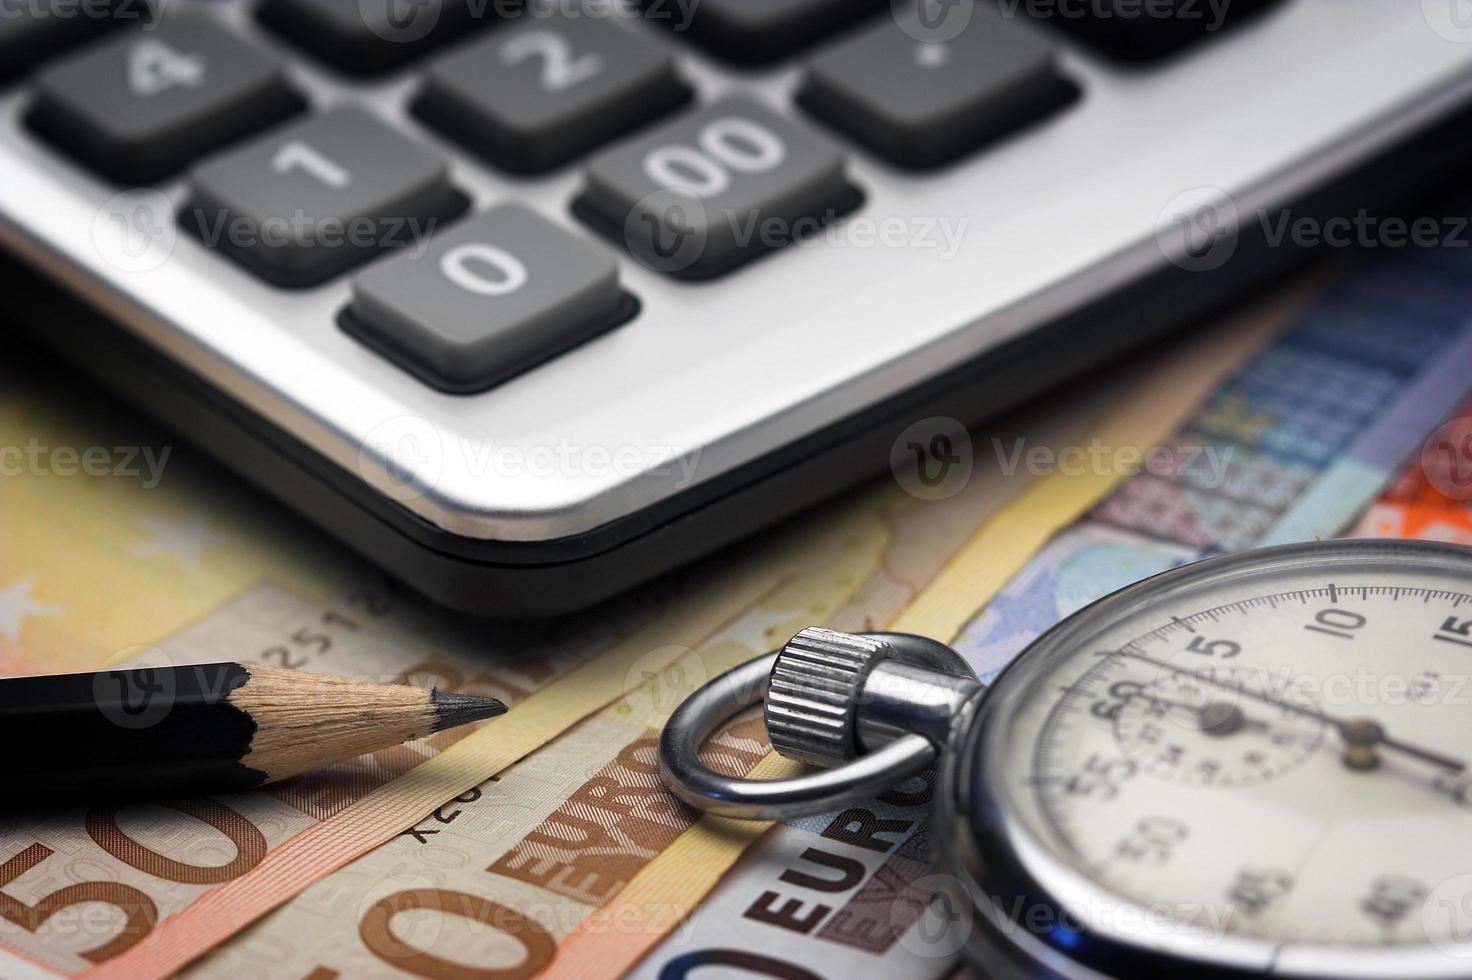 rekeningen, chronometer en rekenmachine foto